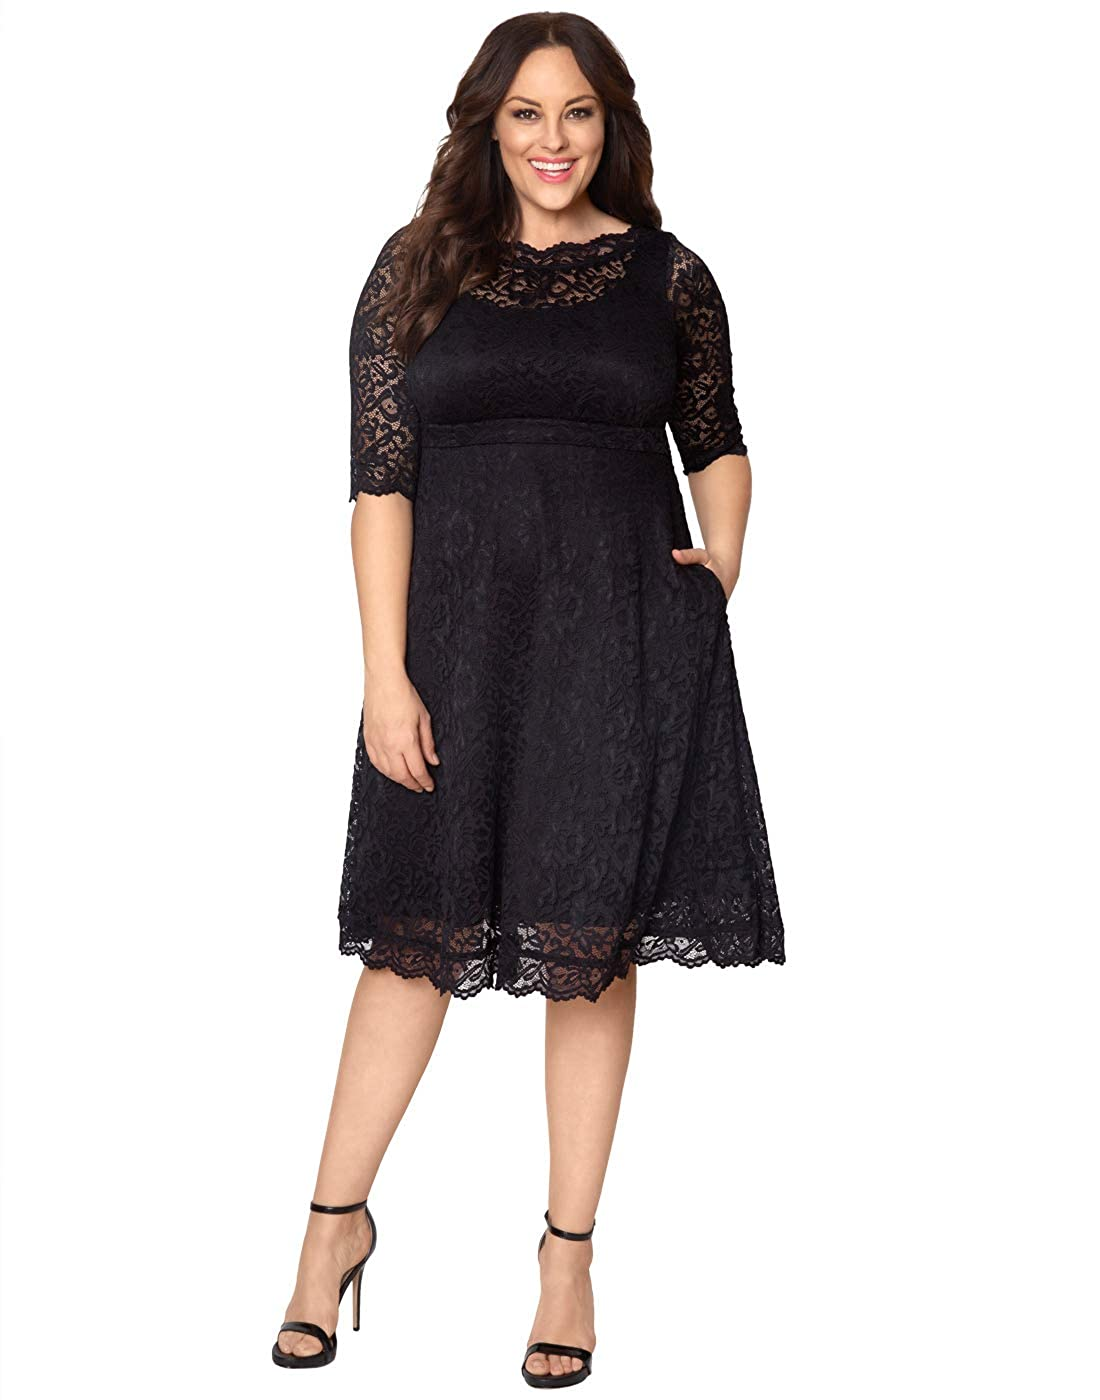 Onyx Kiyonna Women's Plus Size Lacey Cocktail Dress Mauve bluesh